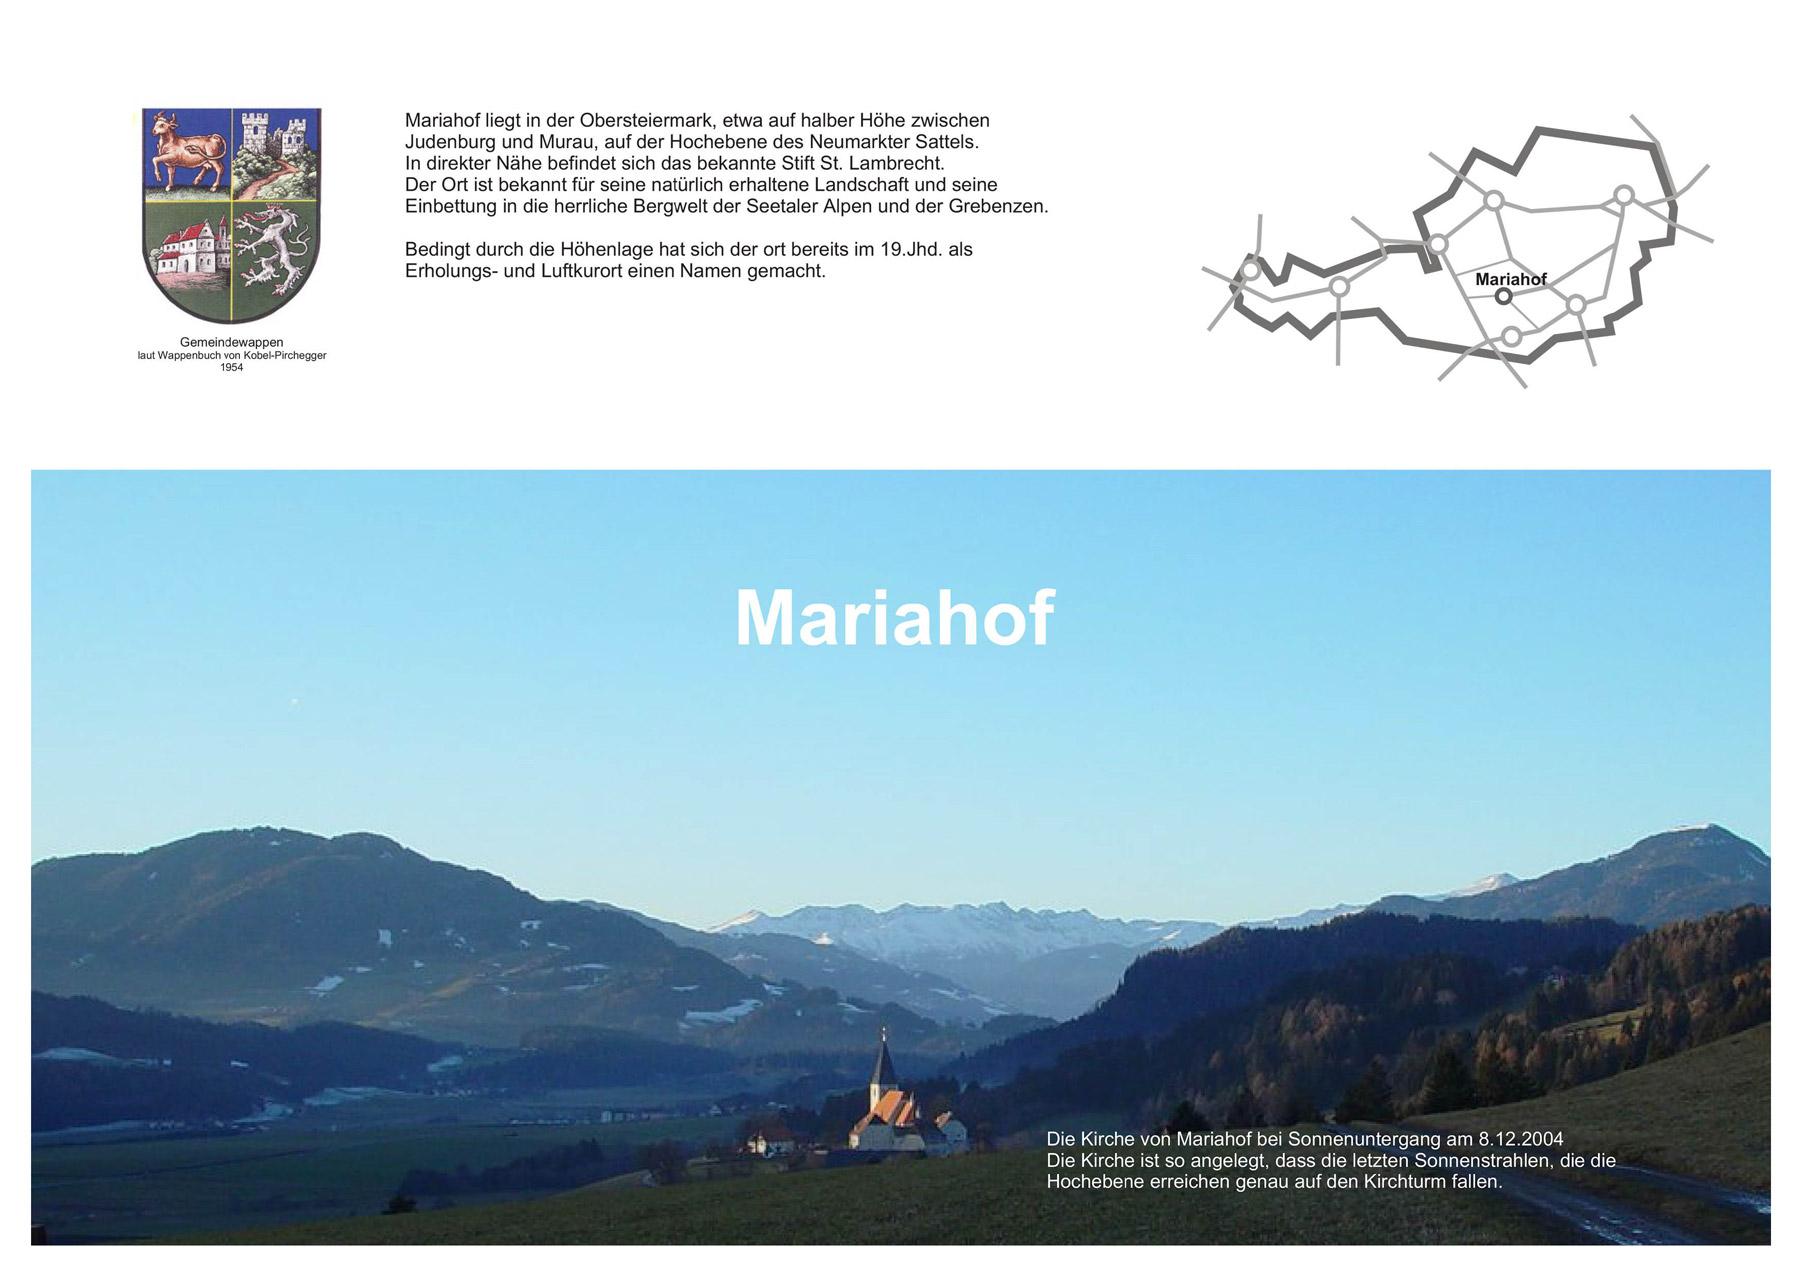 001_Mariahof_Wachkoma_Slide_06